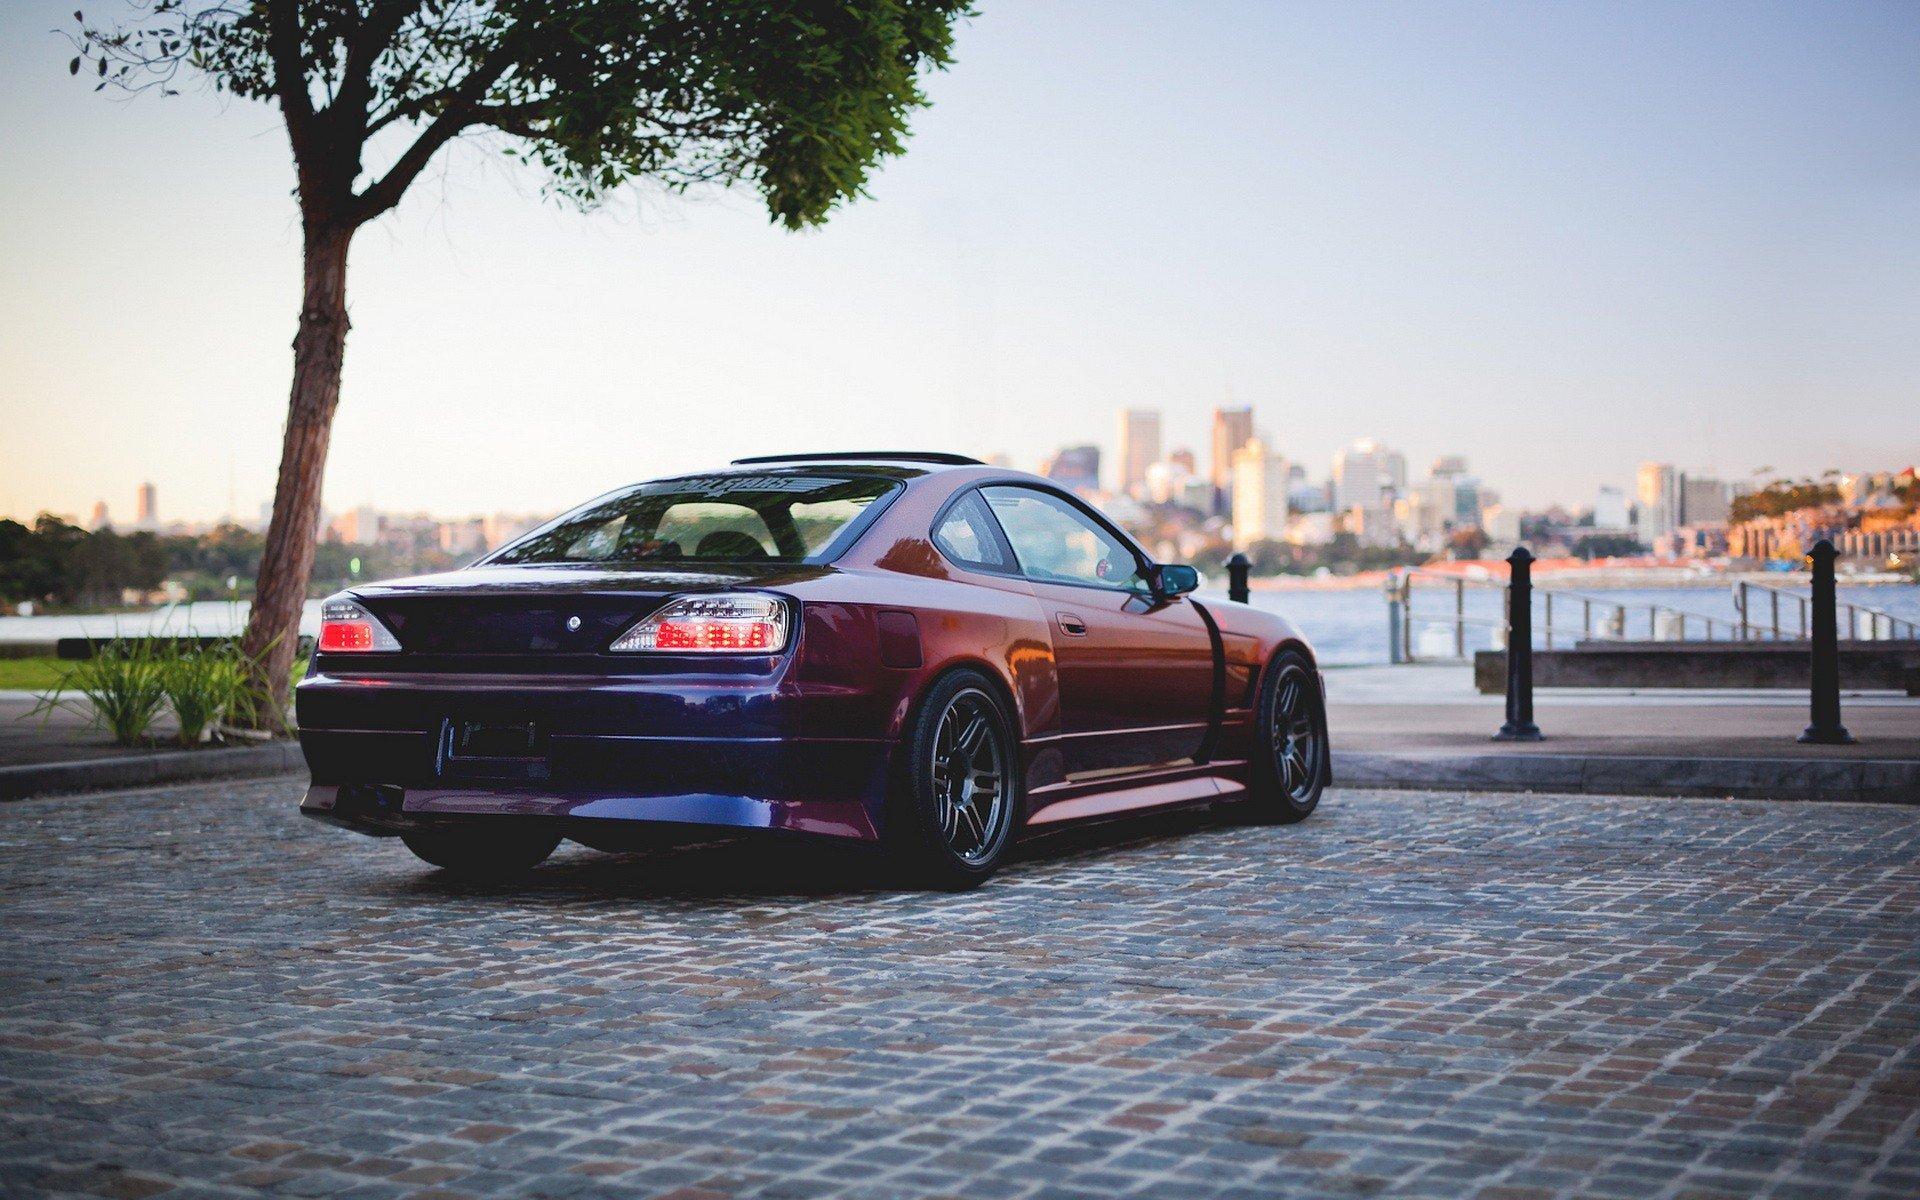 Cars Tuning Australia Nissan Silvia 200sx S15 Wallpaper